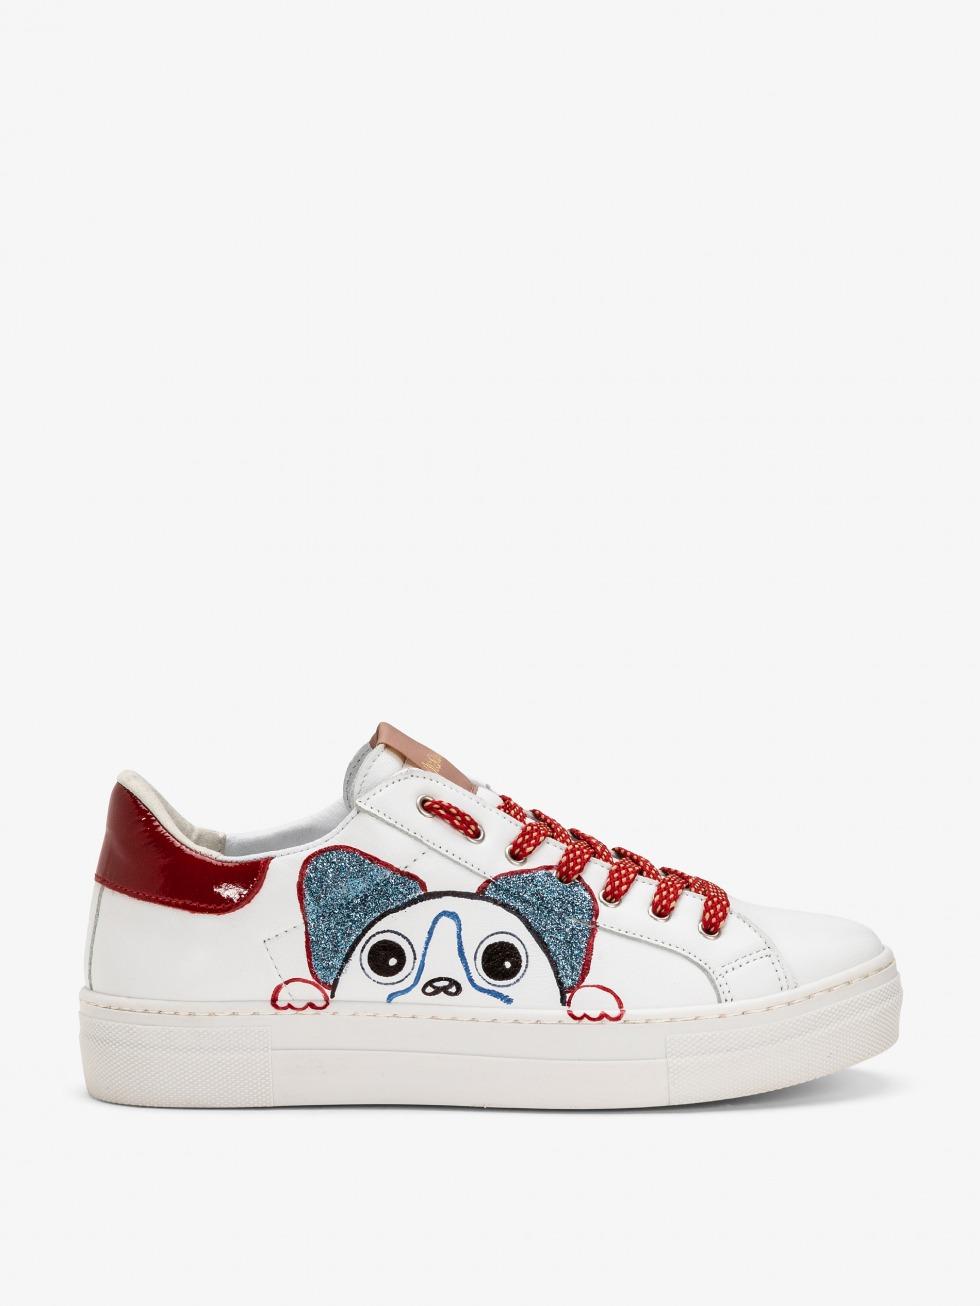 Sneakers Martini Patent Sipario - Dog